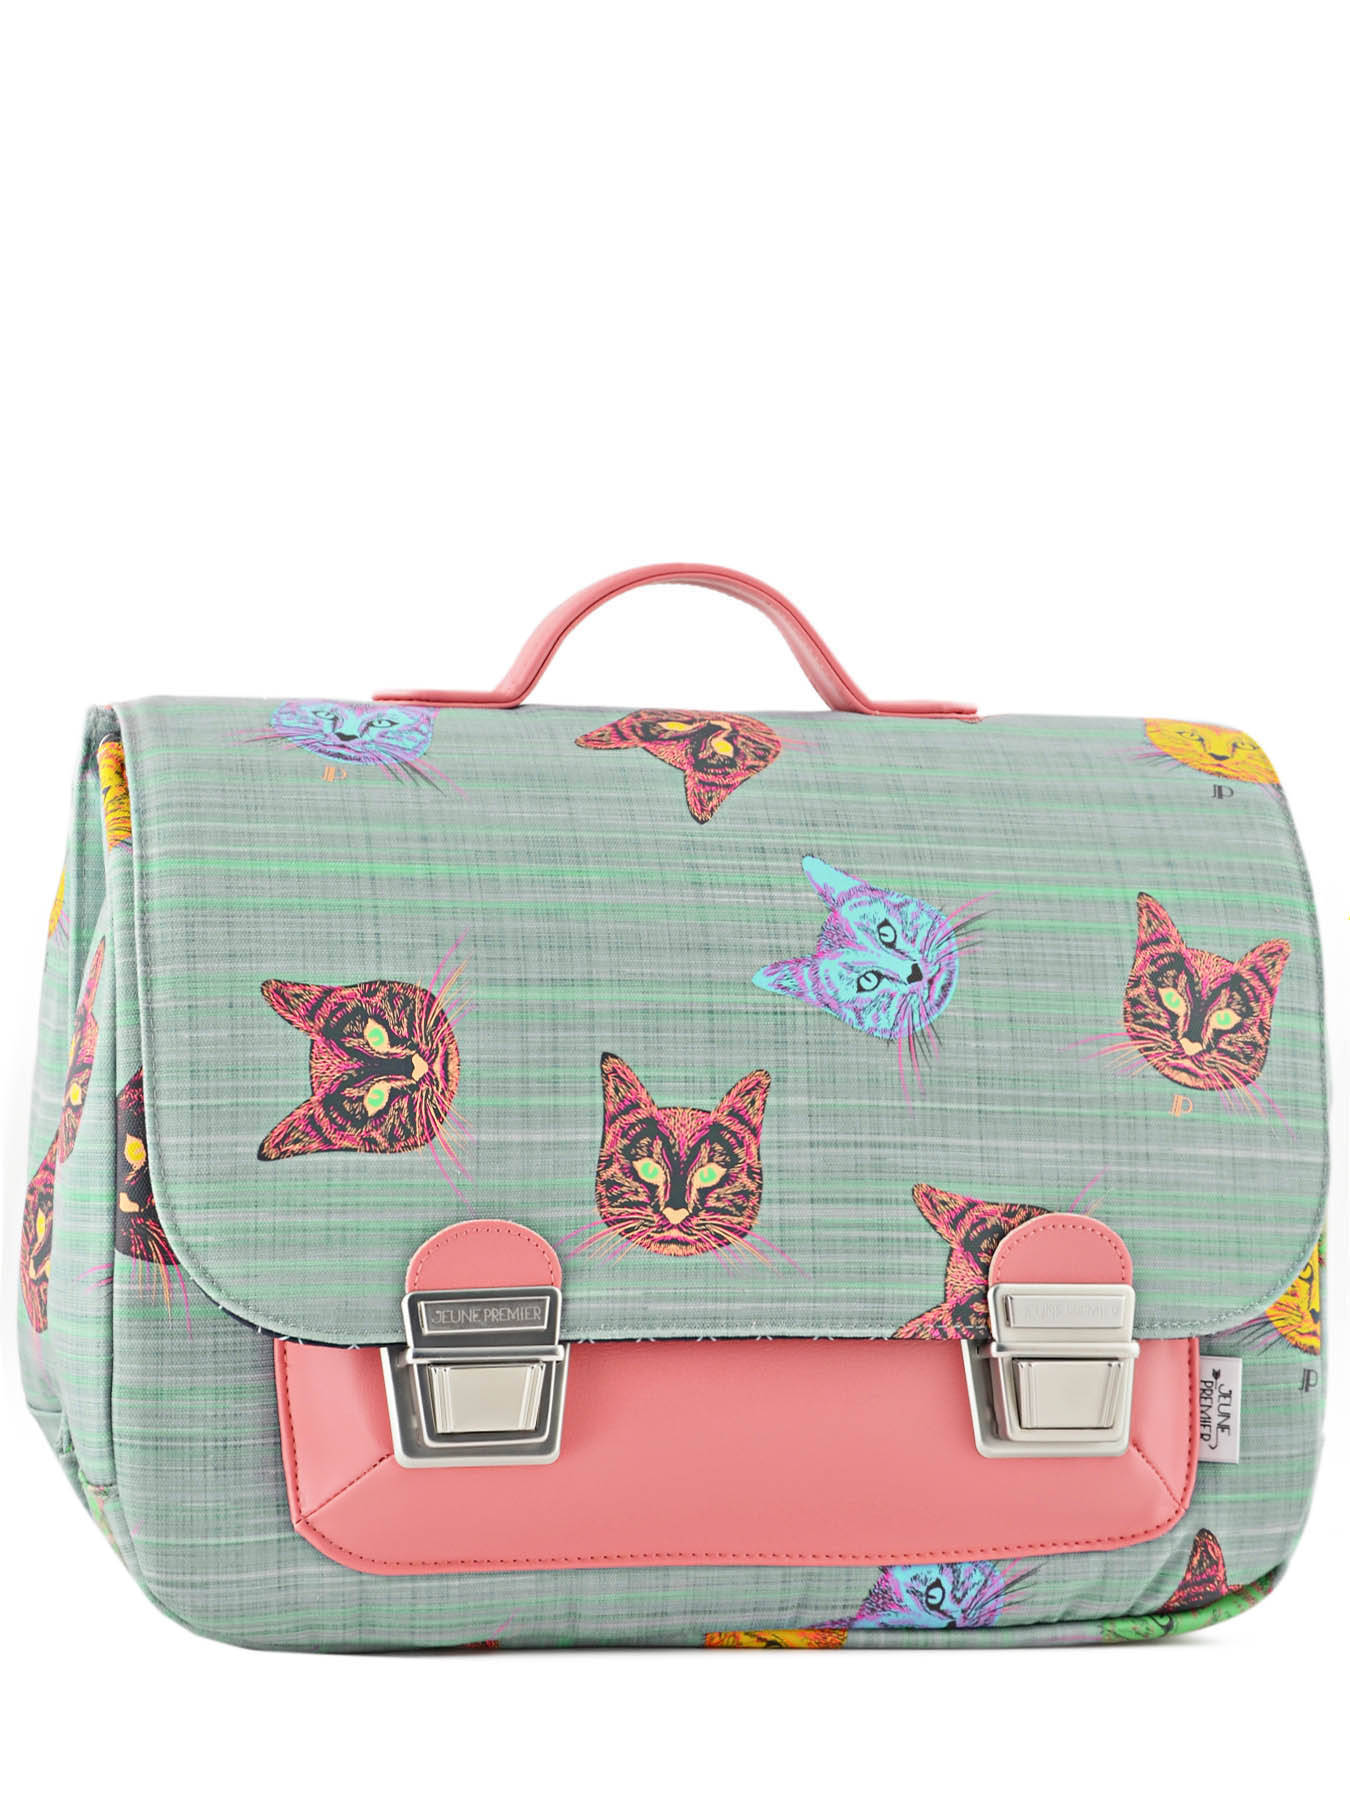 Cartable Jeune Premier It bag Maxi Kittens 40 cm bleu 2NzYe8P